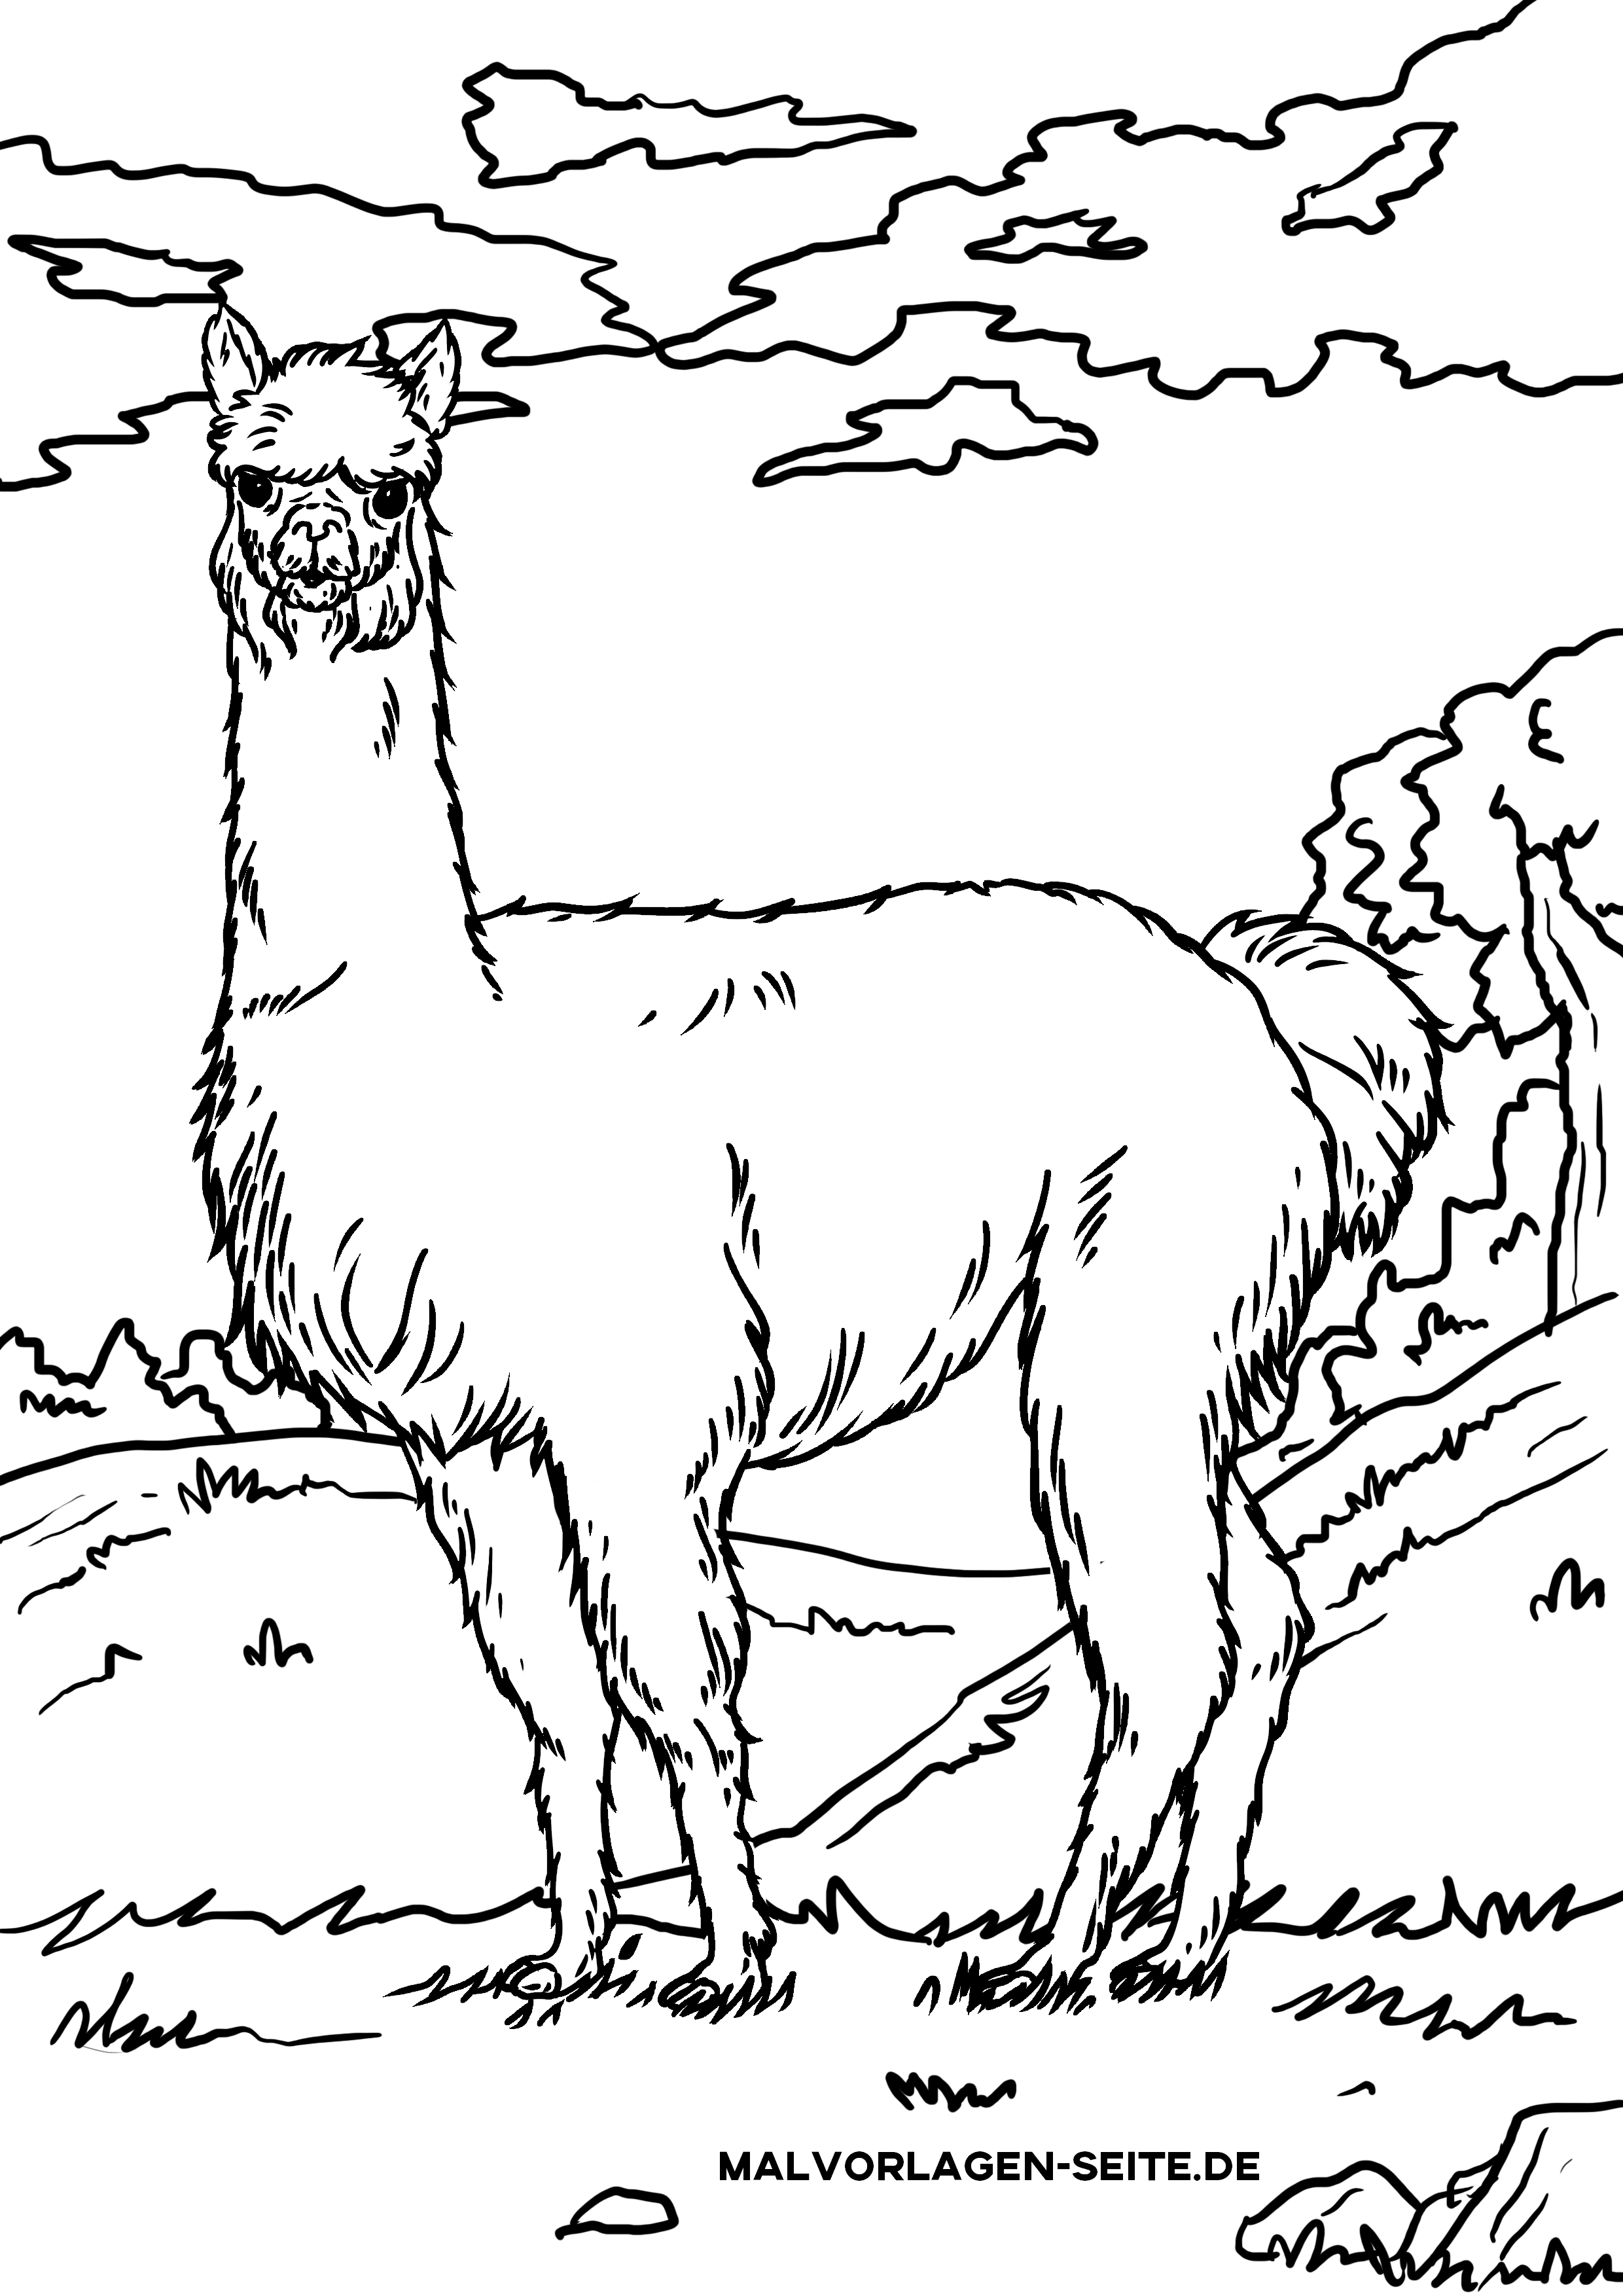 Malvorlage Alpaka / Lama - Tiere - Kostenlose Ausmalbilder